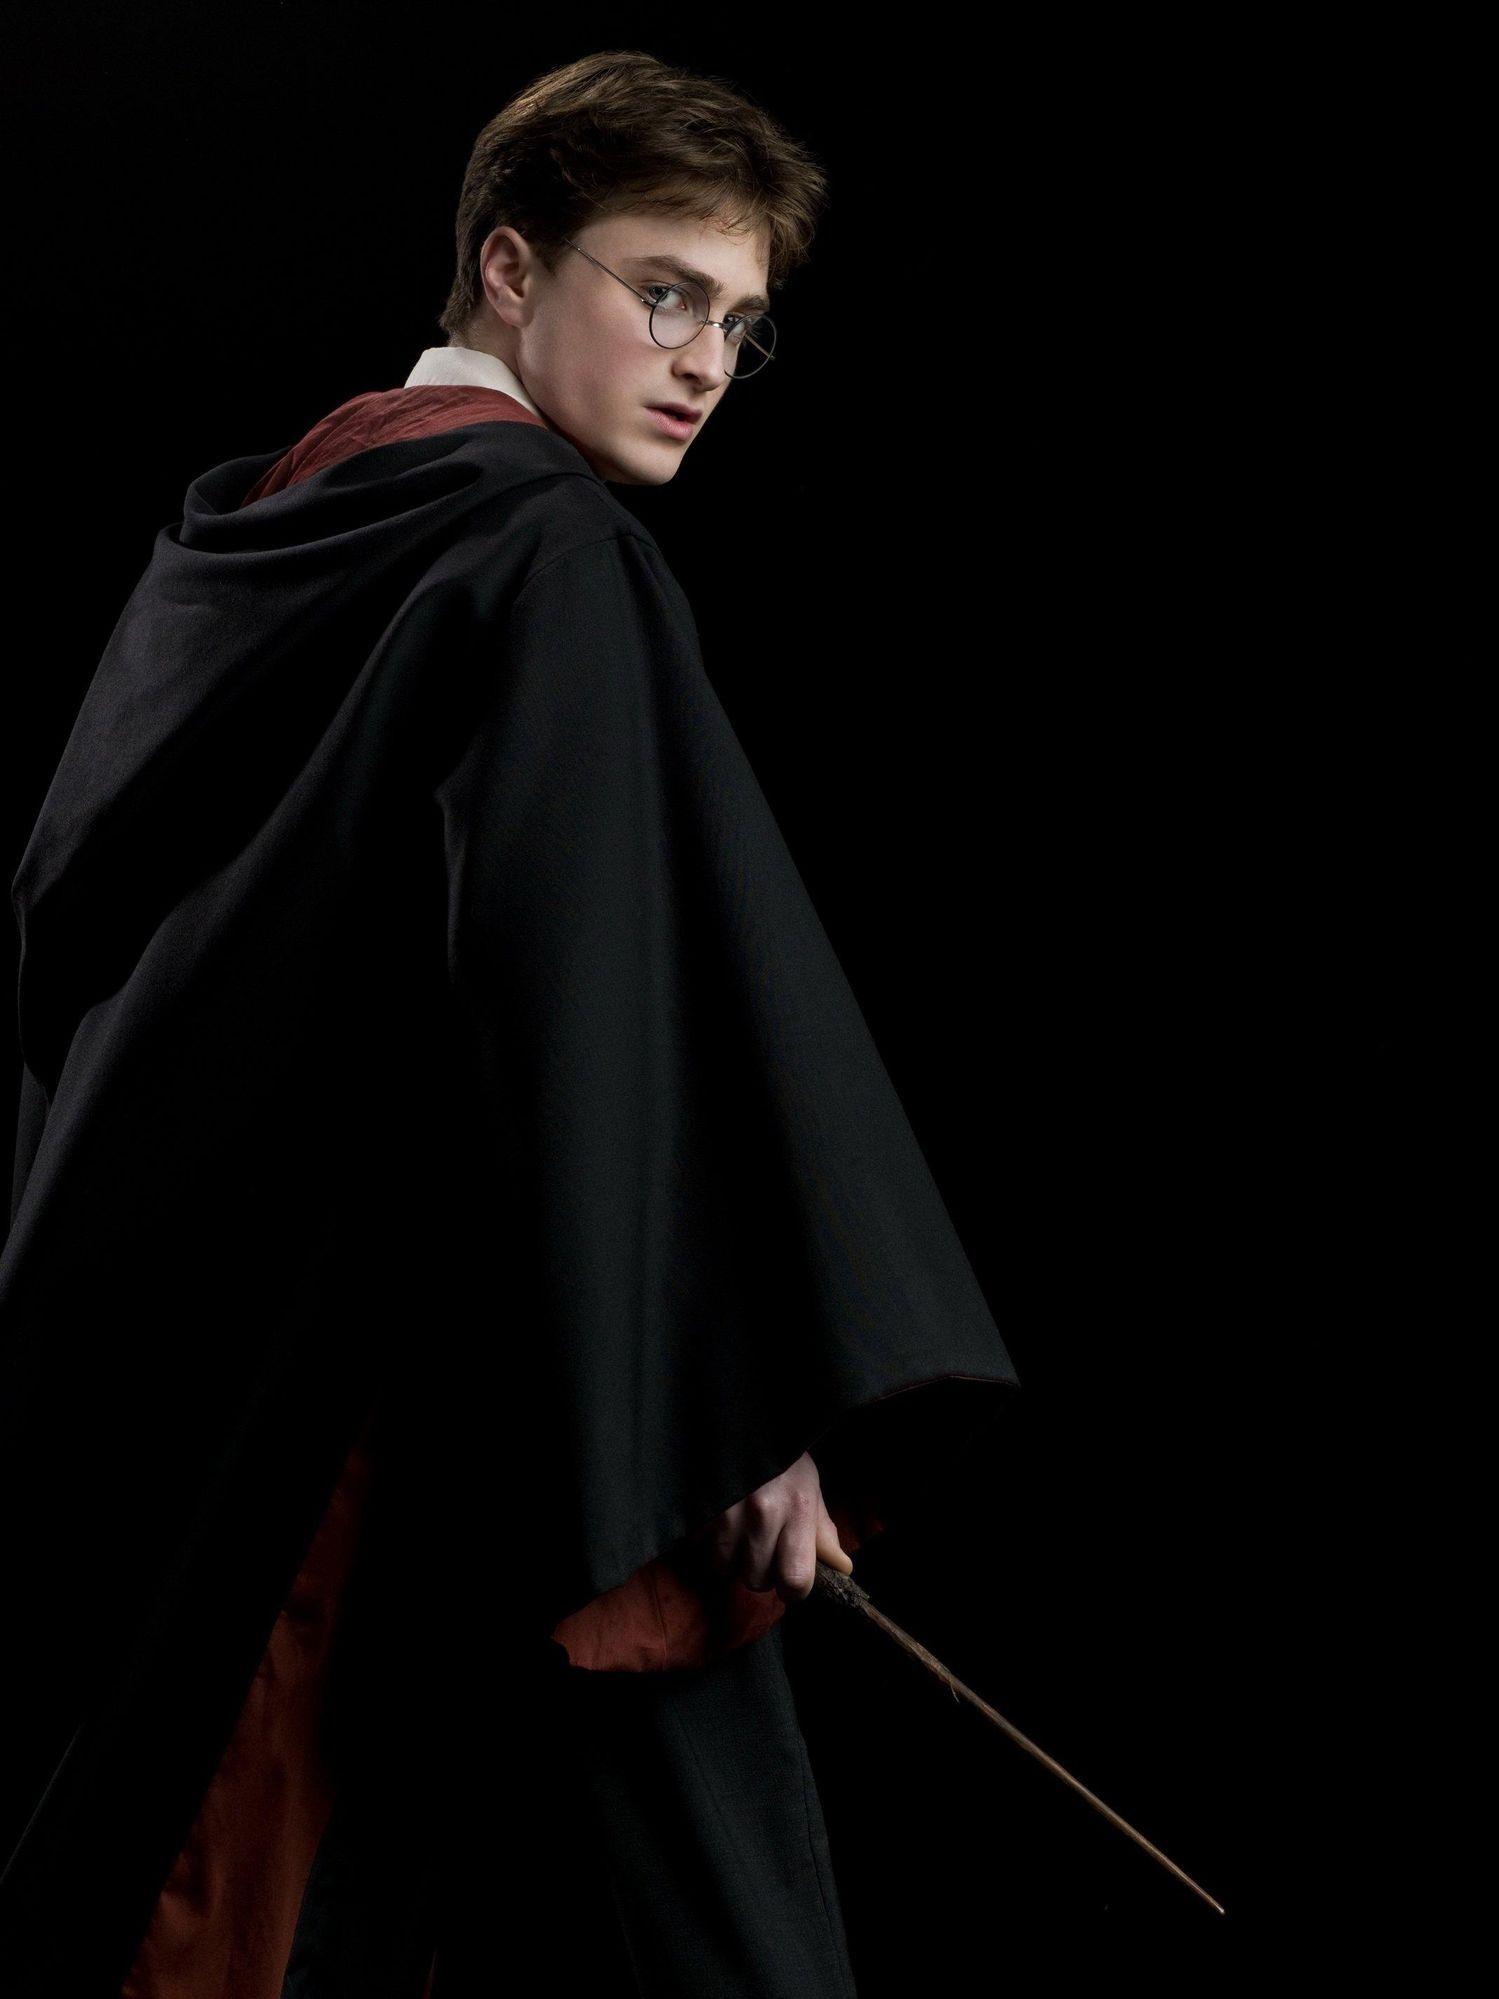 2009 Harry Potter Half Blood Prince Promotional Shoot Photo on Pet Theme